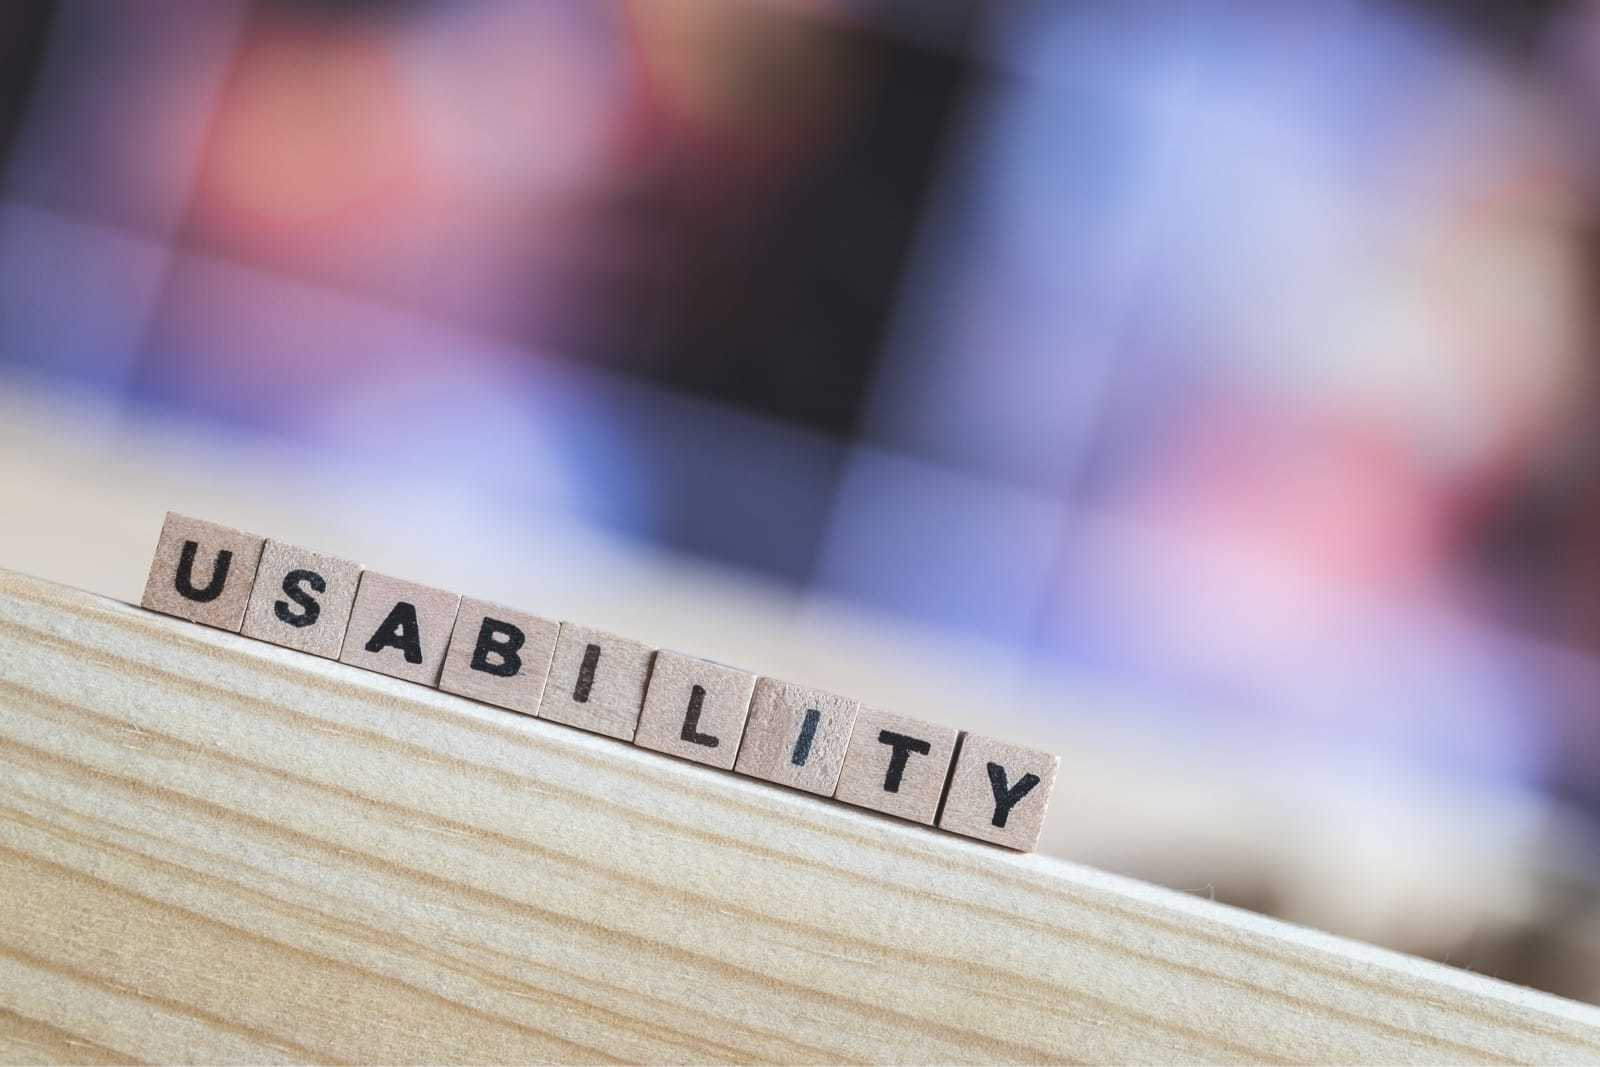 「usability」と印字されたブロック